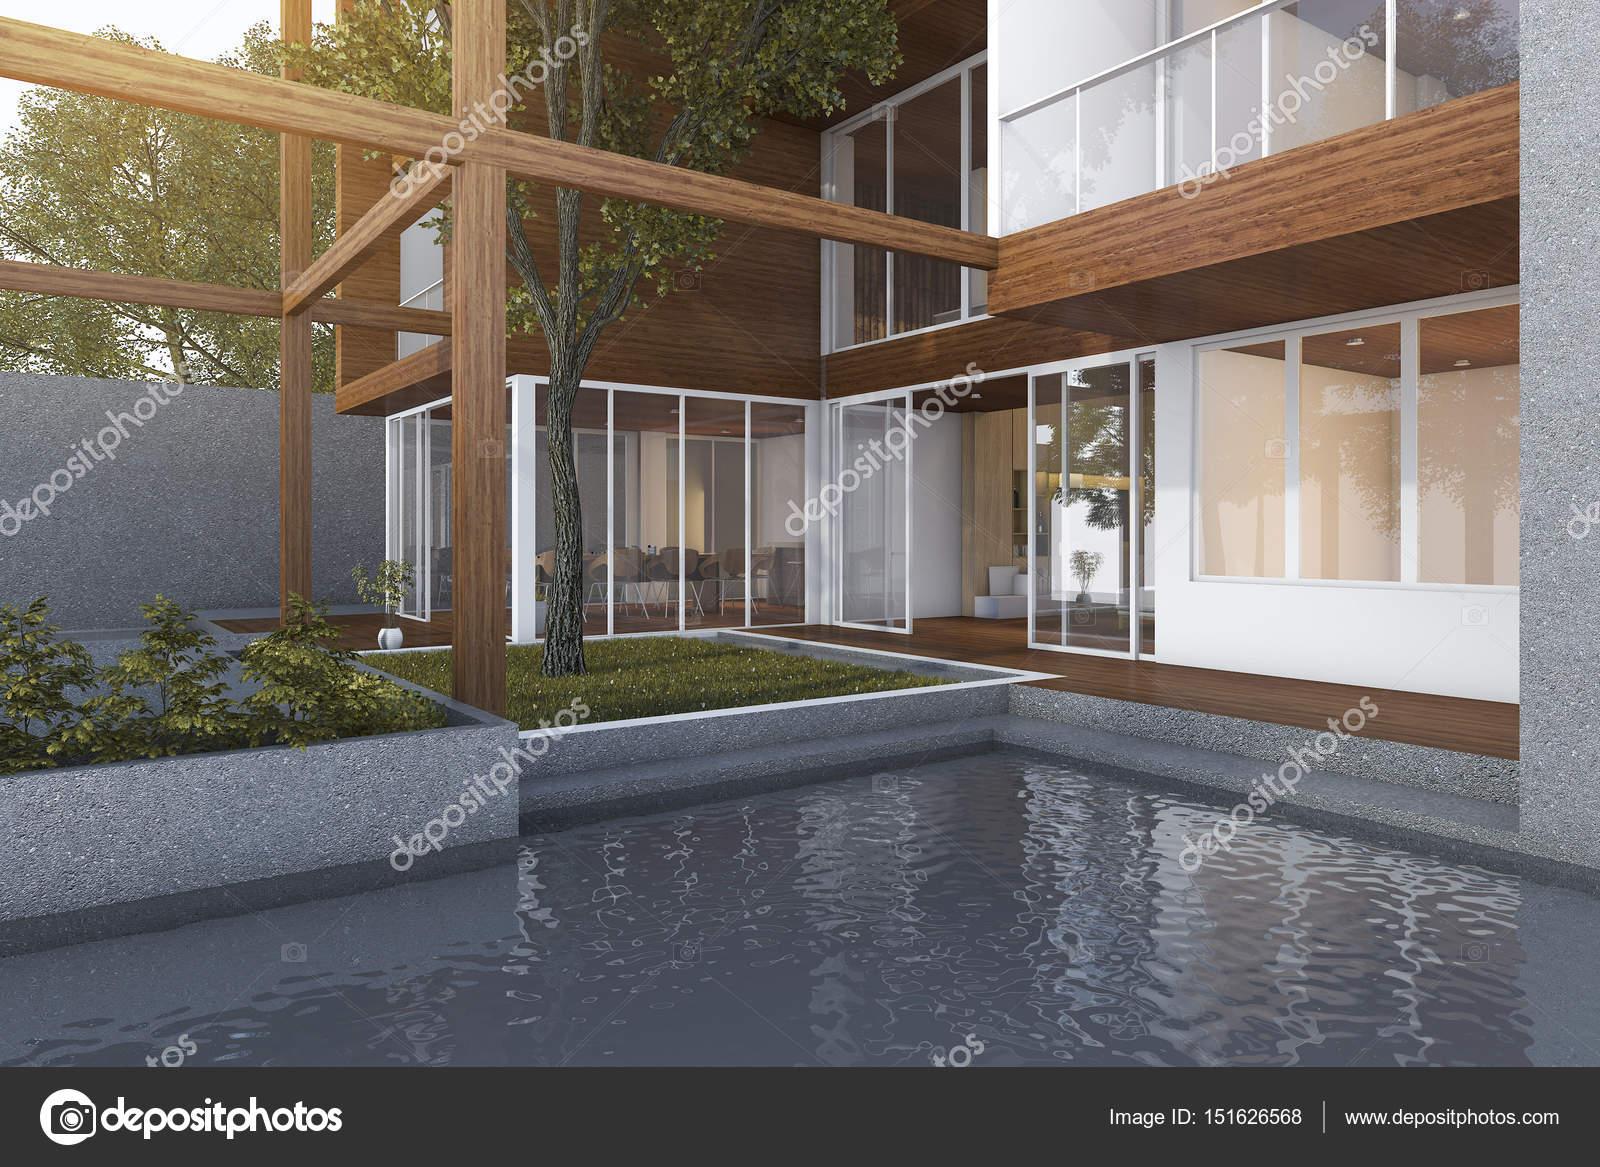 Pool design holz  3D Rendering-outdoor-Pool in der Nähe von Holz moderne Gebäude ...